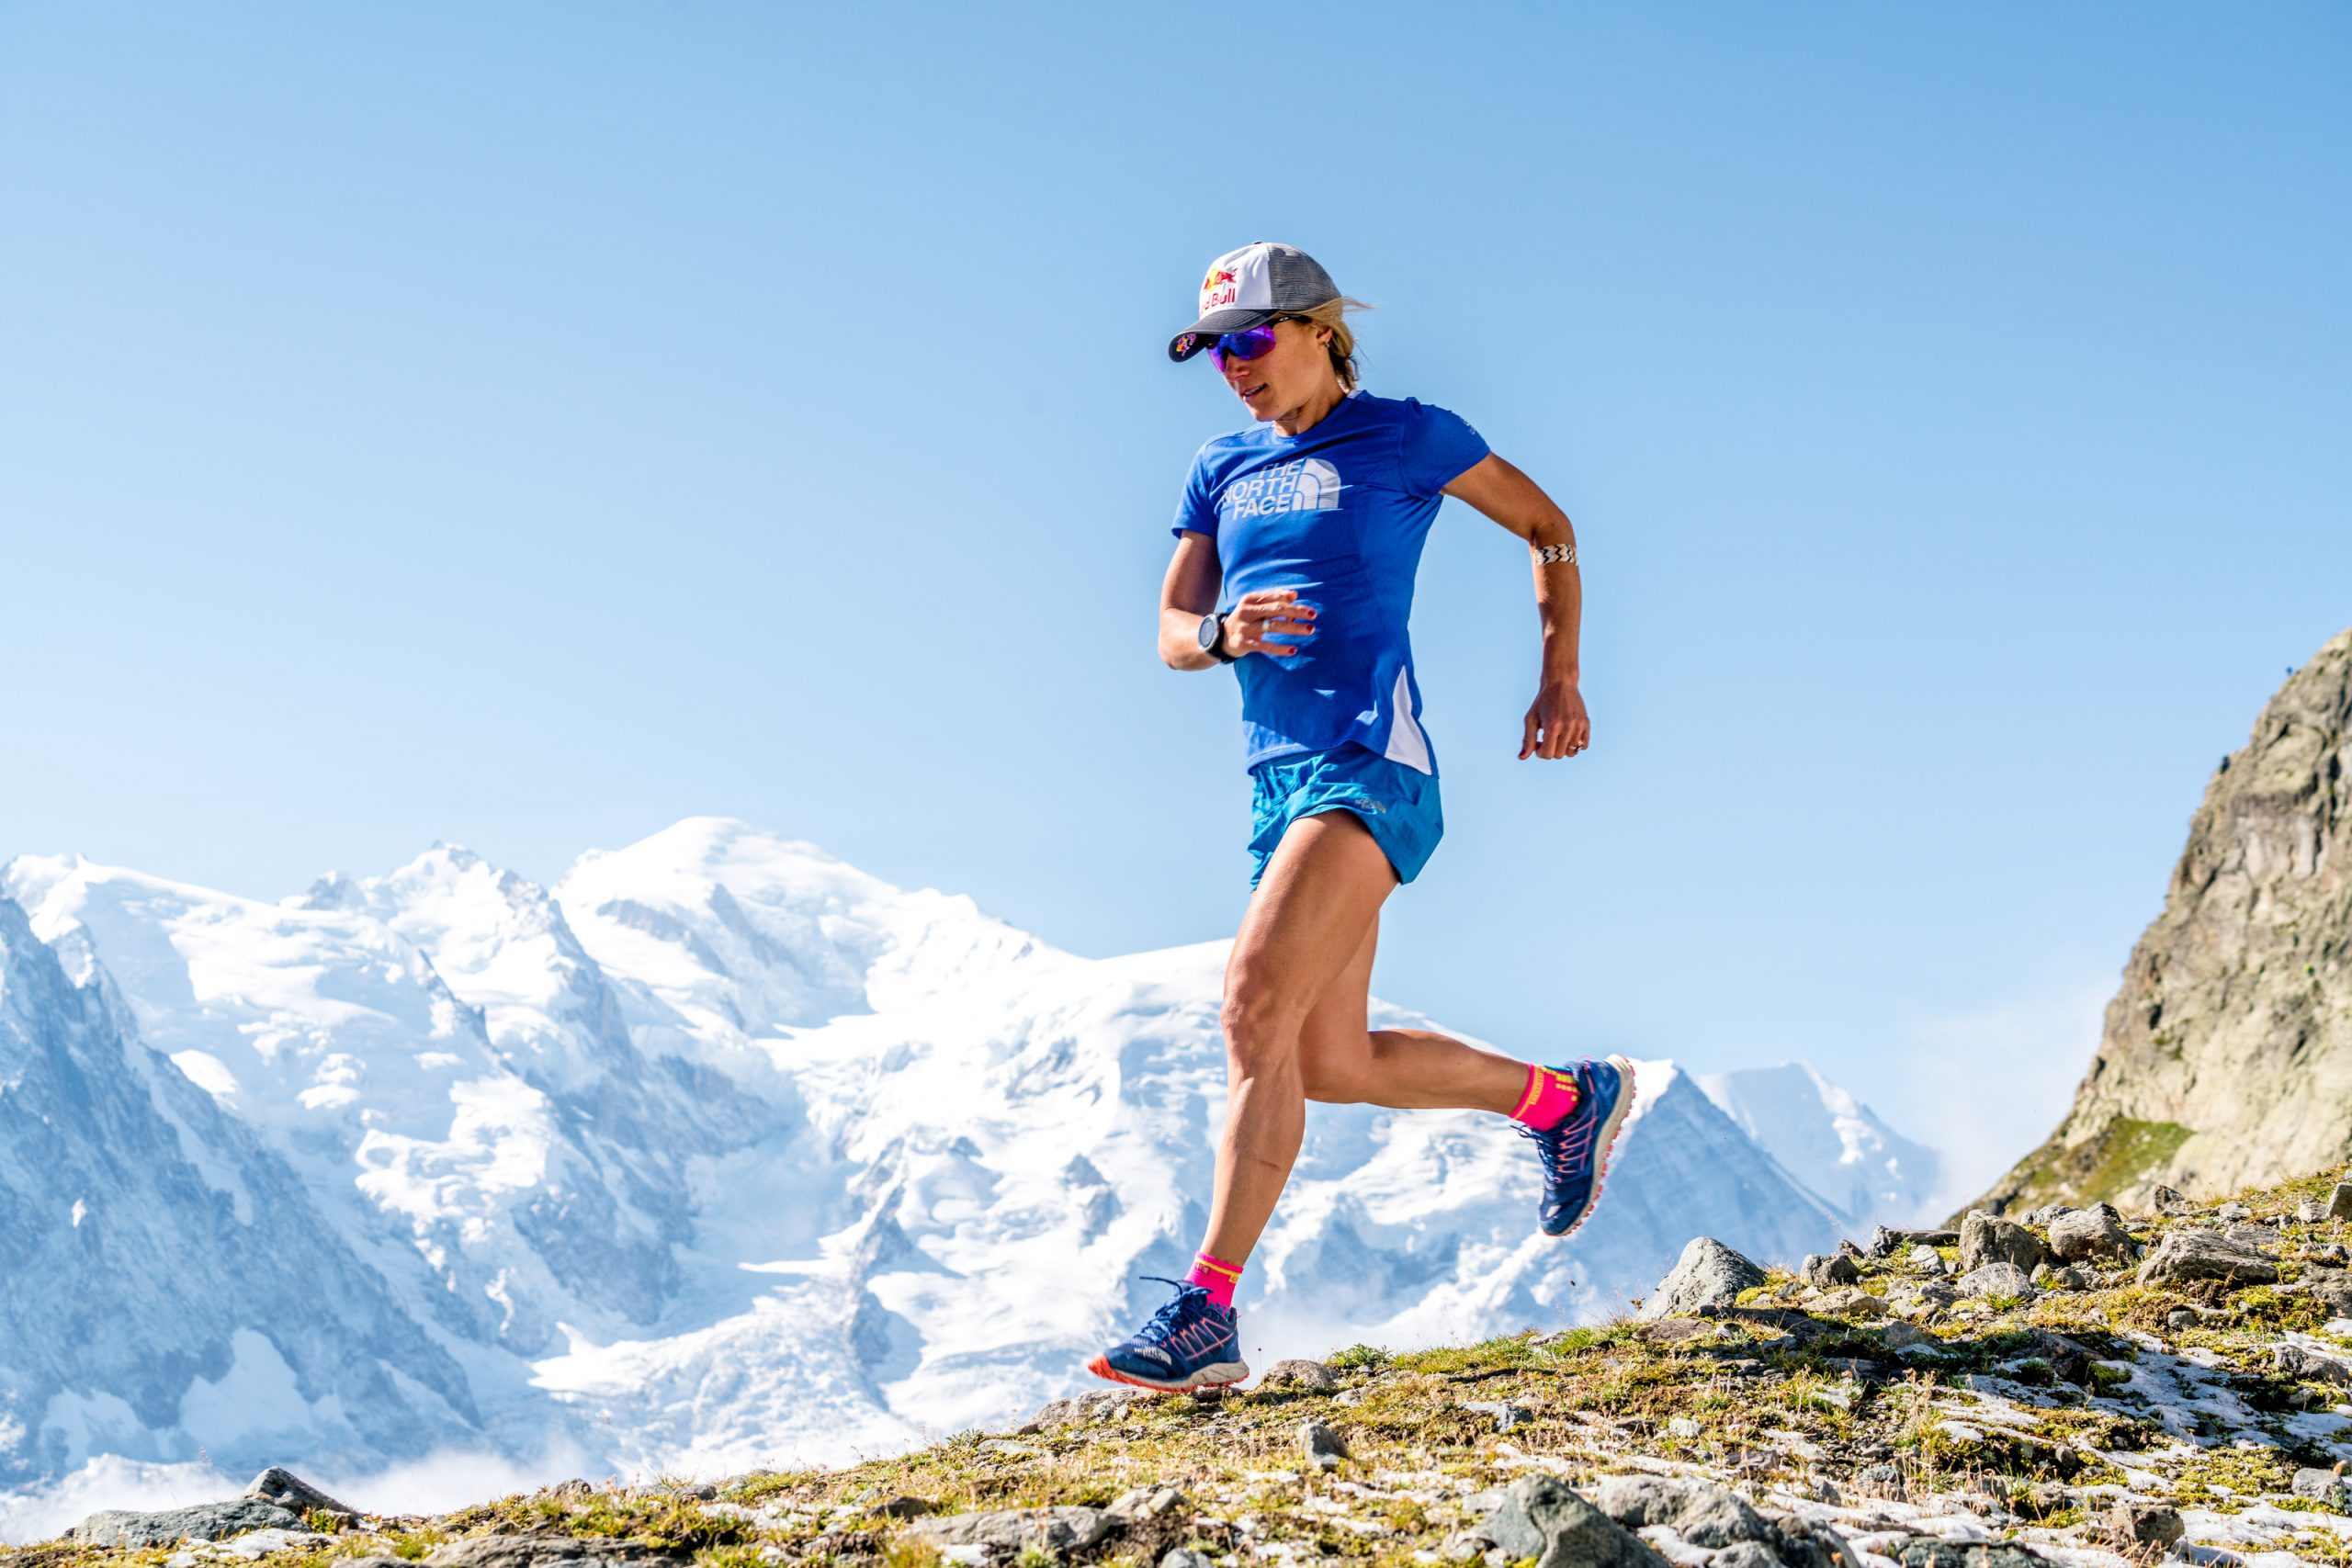 Fernanda Maciel encara 170km em busca do mundial de ultramaratona - Foto: Mathis Dumas / Red Bull Content Pool